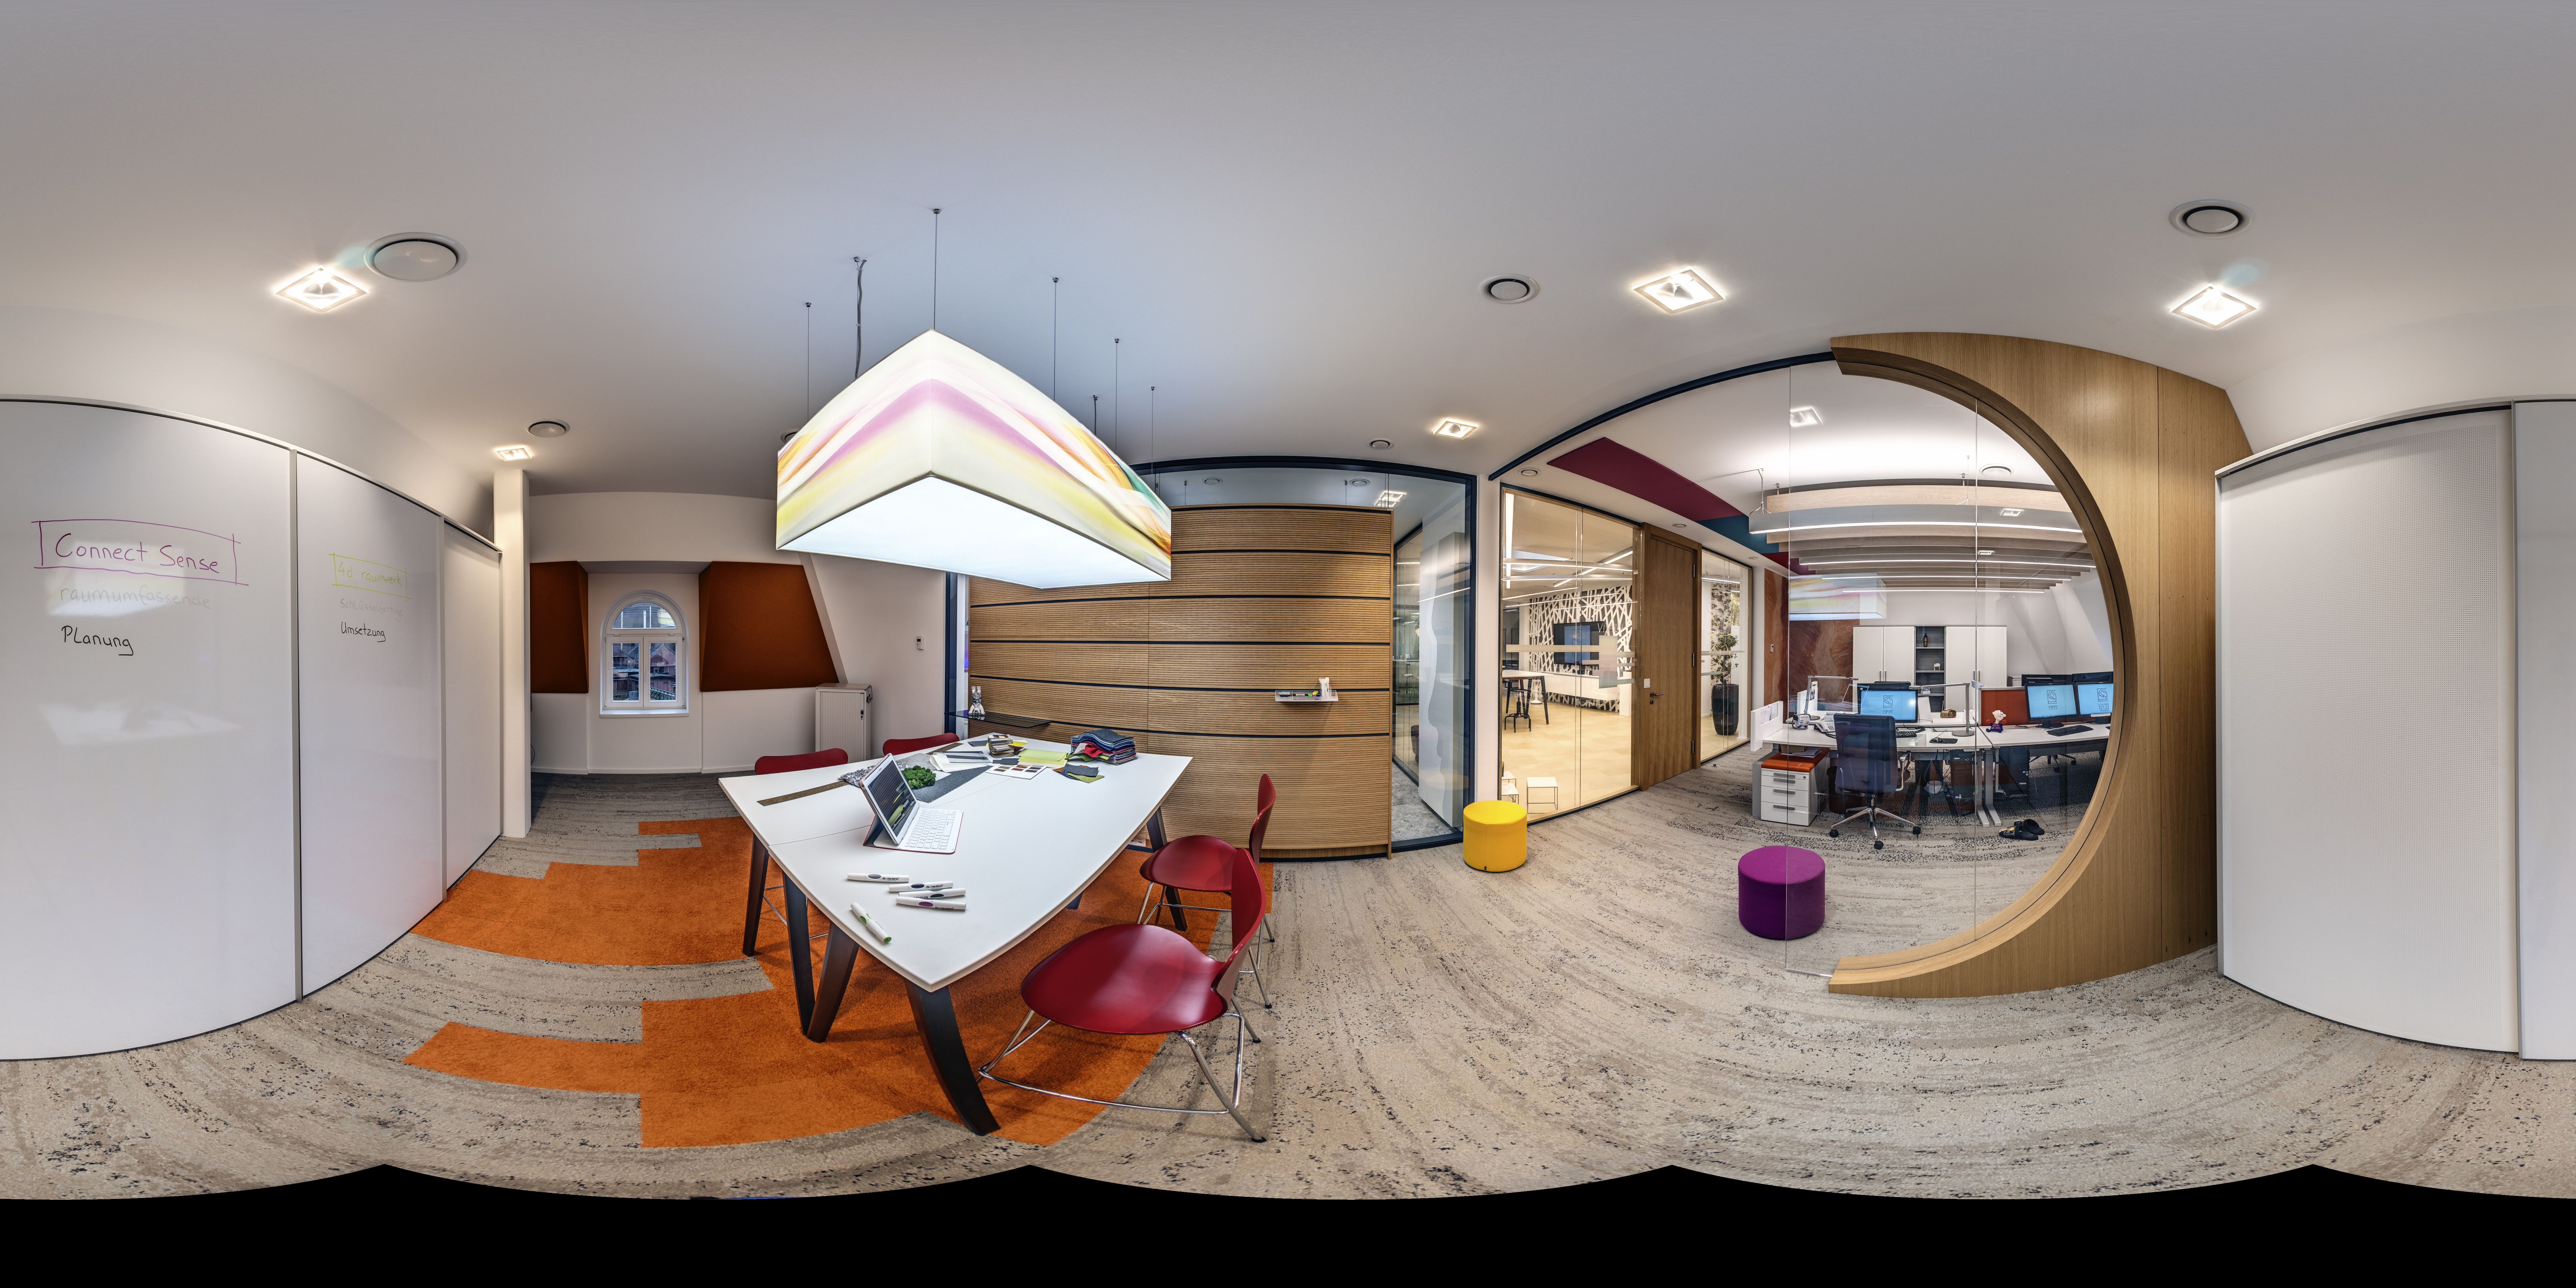 Living Projecting Projektraum Connect Sense Gmbh Co Kg Innenarchitektur Loft Innenarchitekt